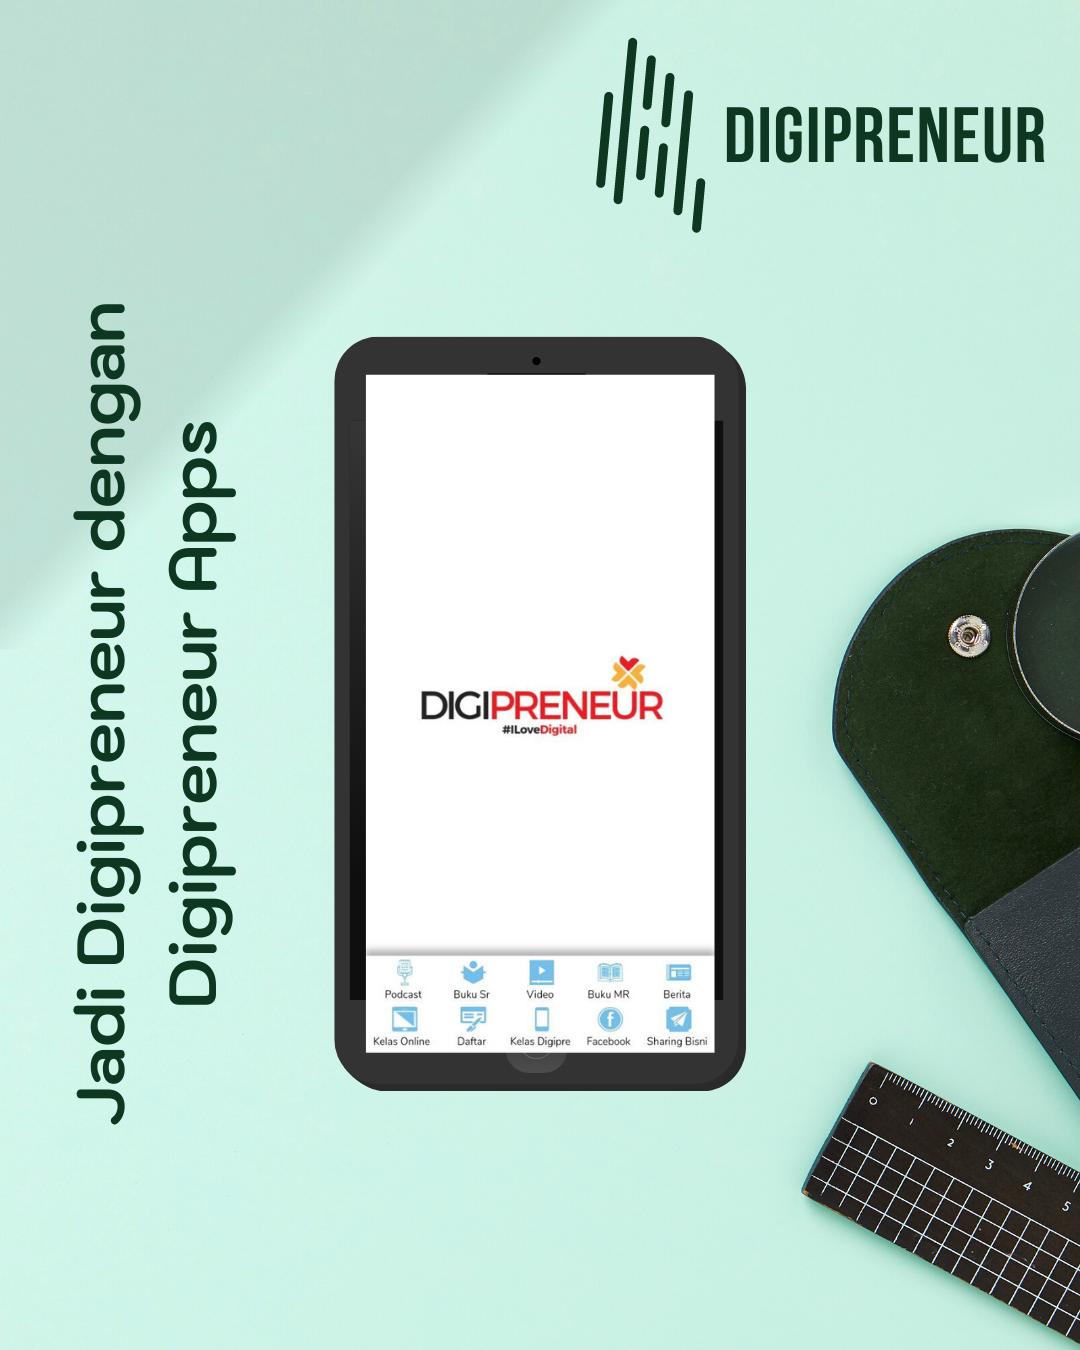 Digipreneur Apps Promo